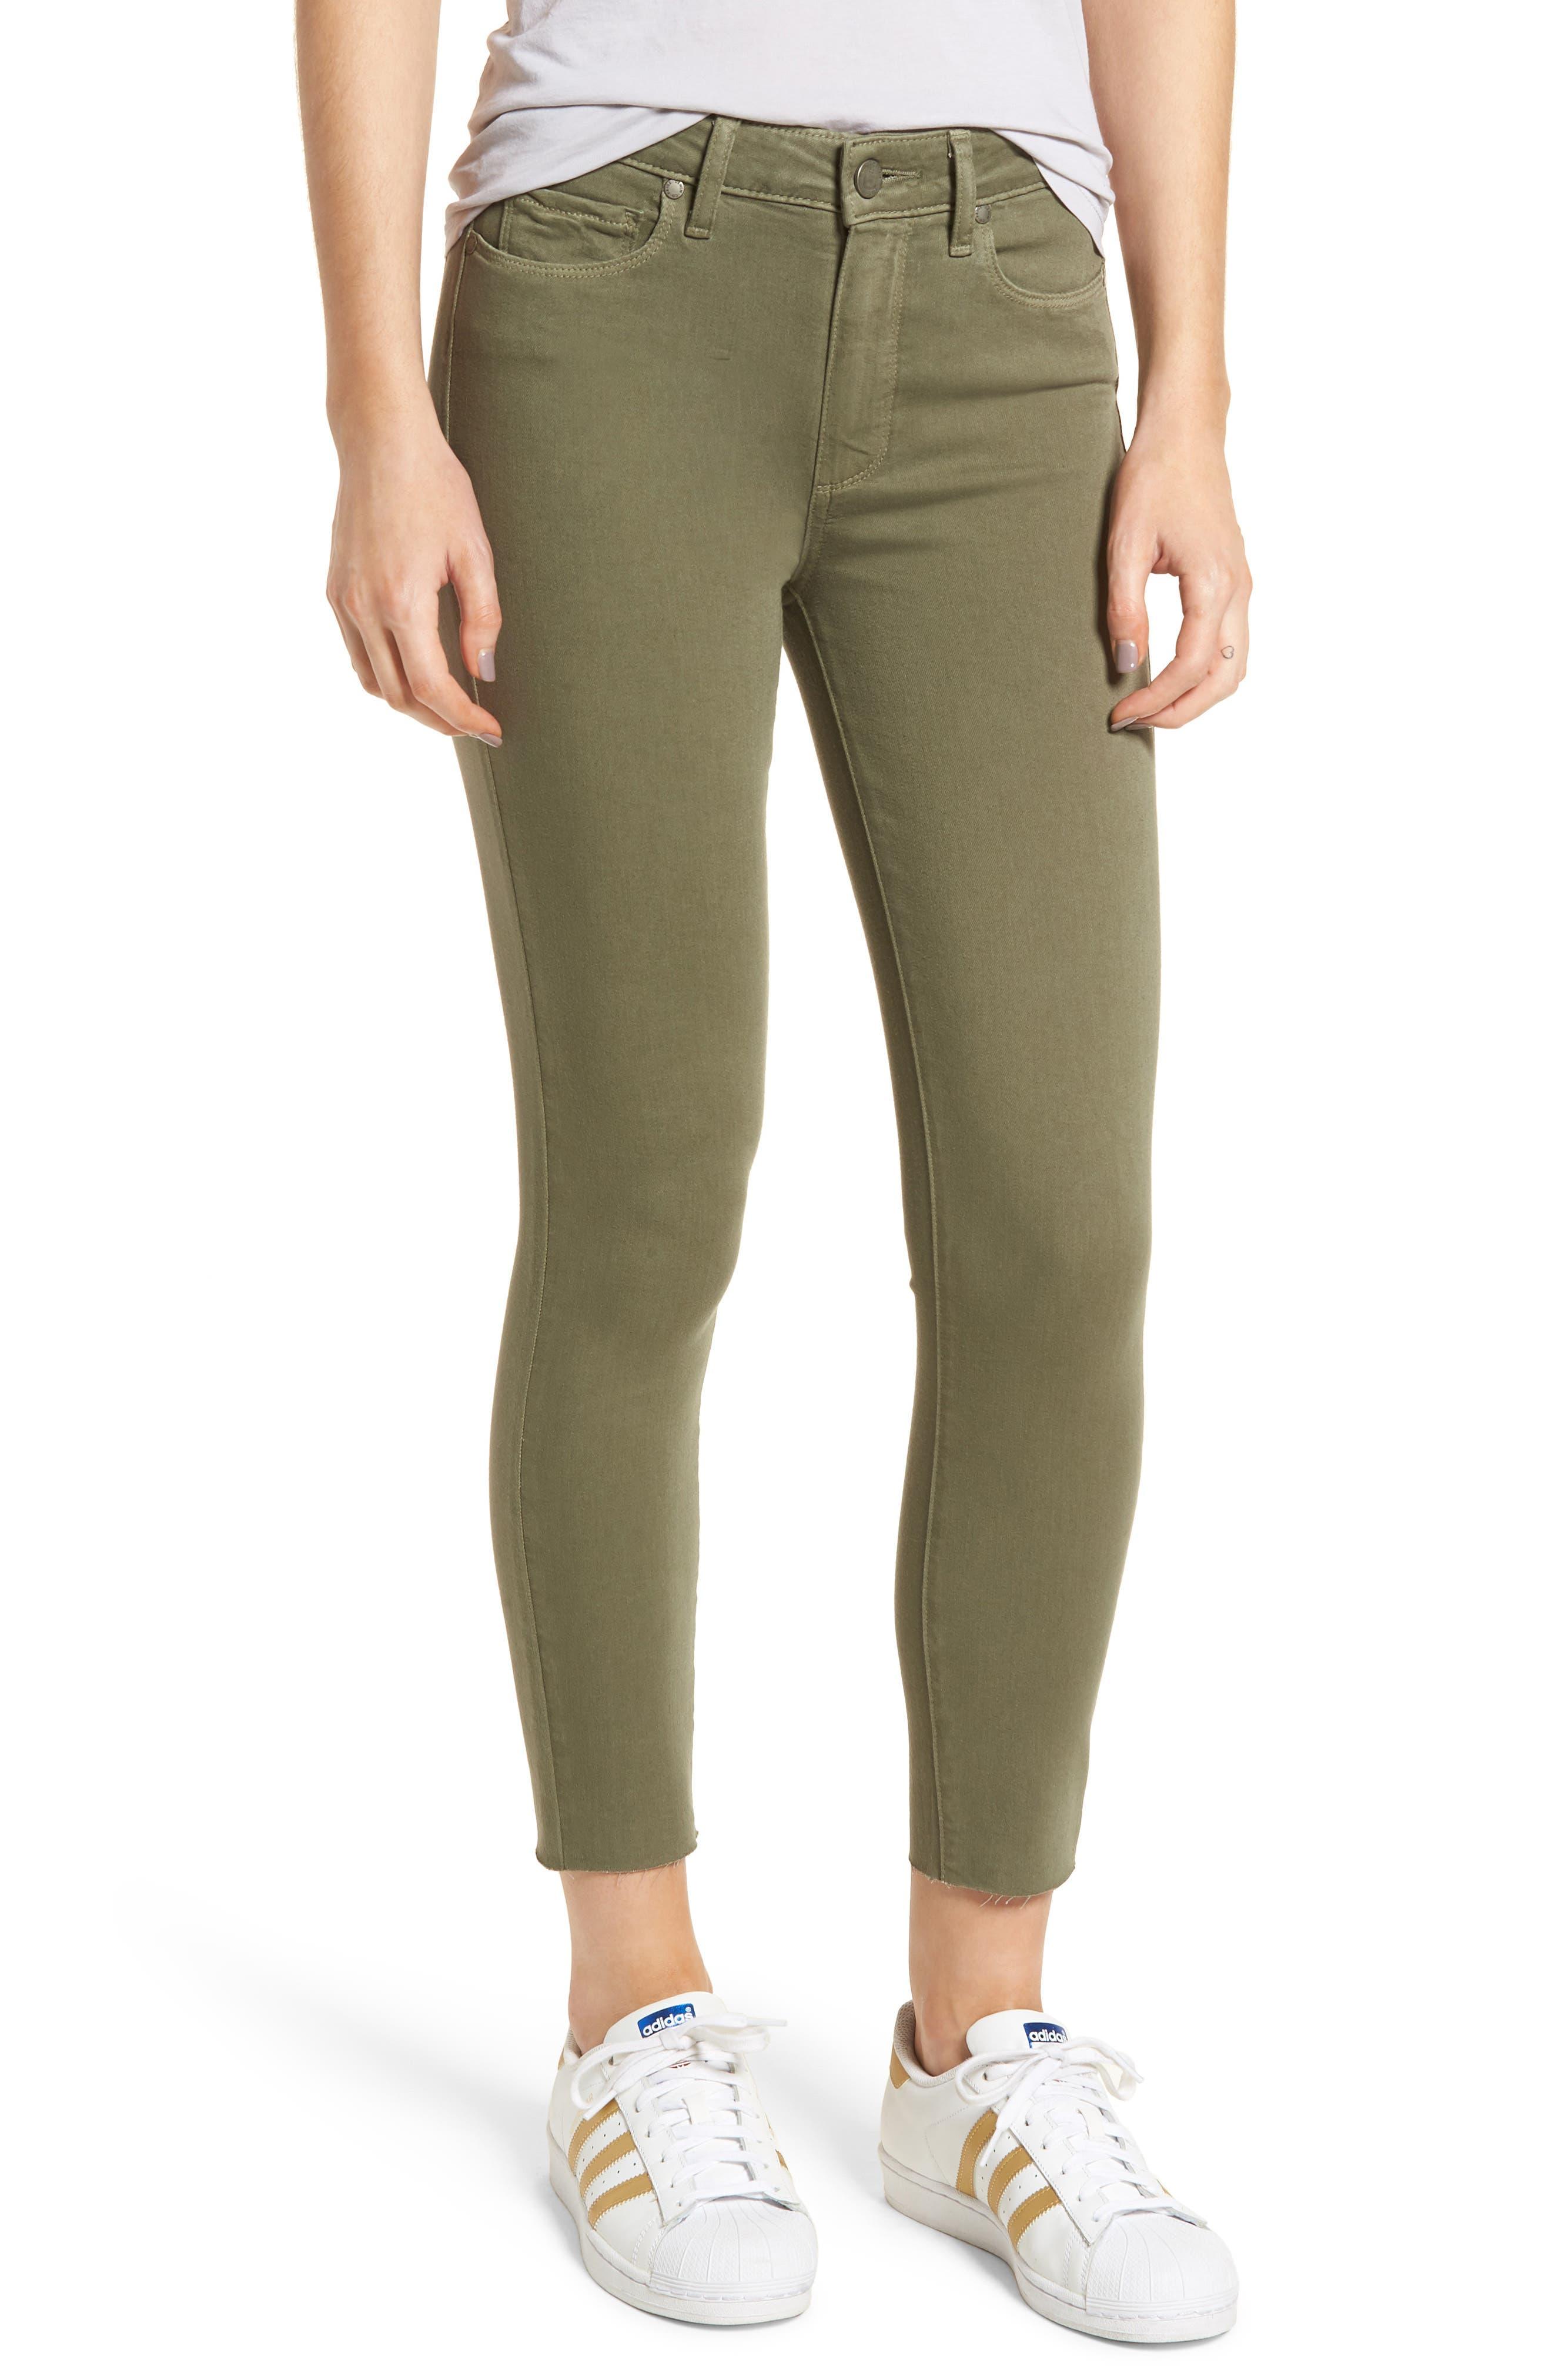 Hoxton Transcend High Waist Crop Skinny Jeans,                             Main thumbnail 1, color,